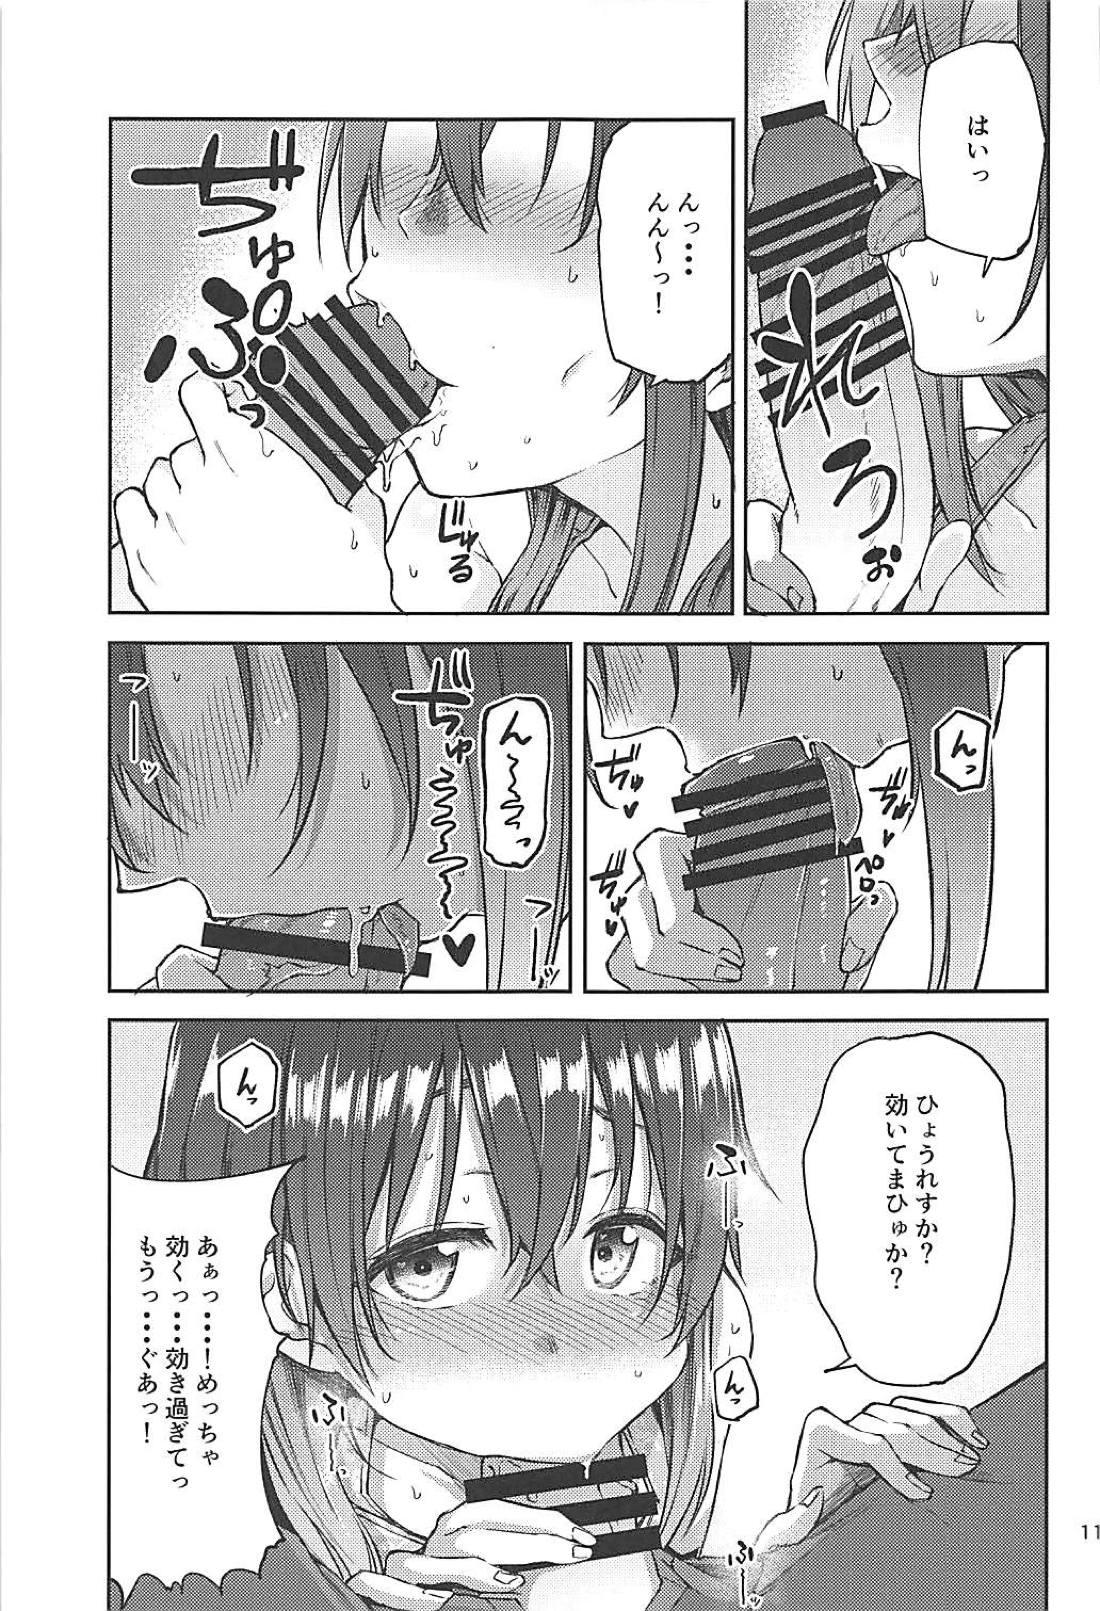 Hajime-chan to Itoshiisaa 8